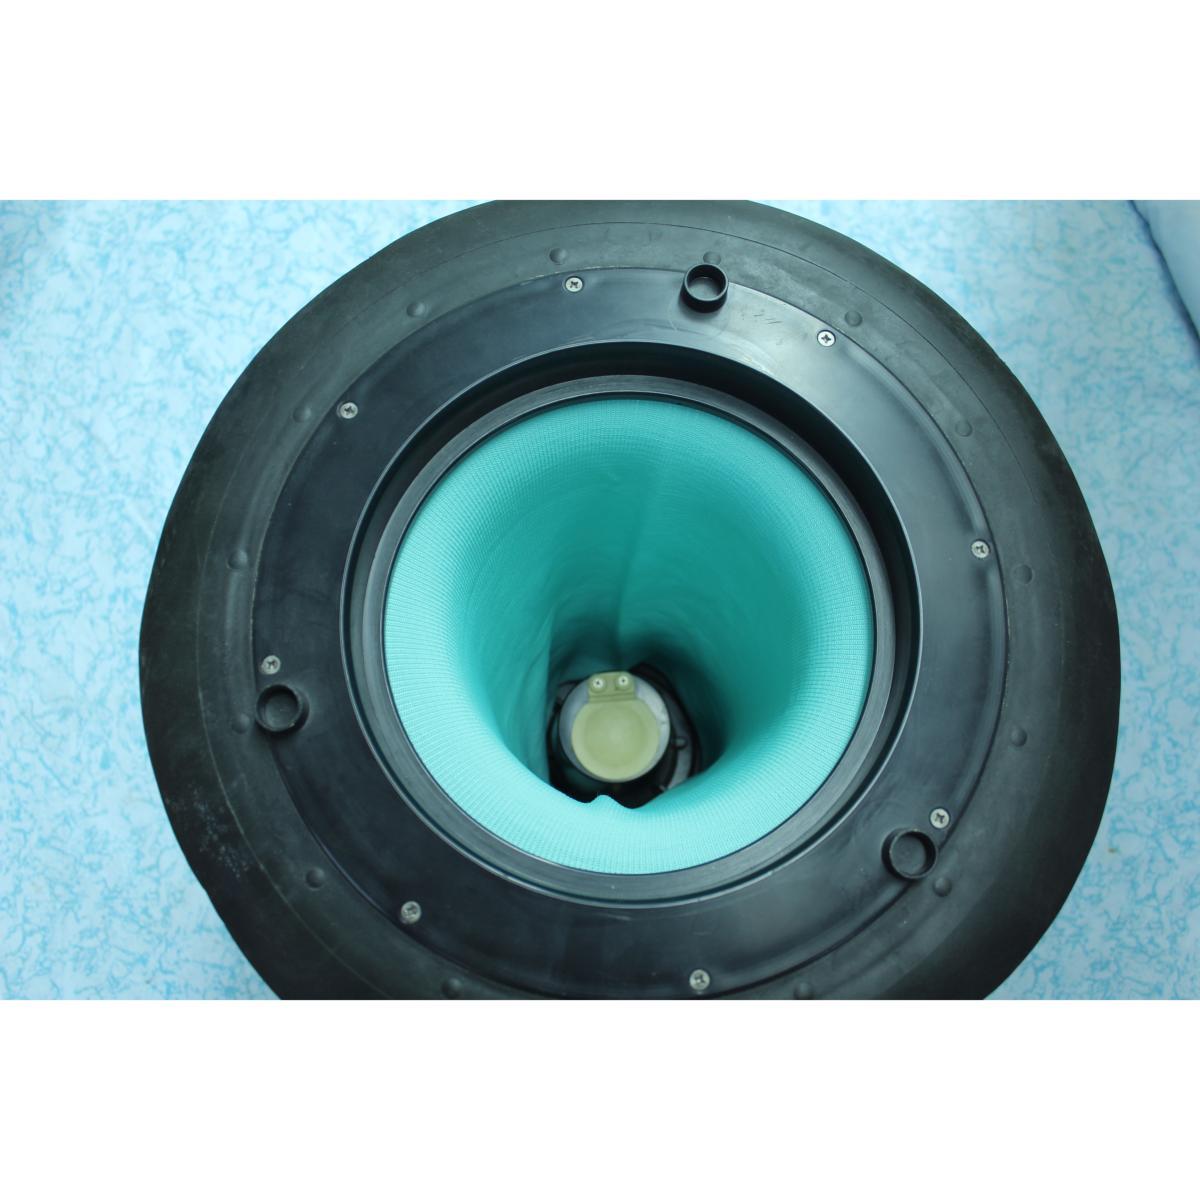 Protection de cartouche filtrante magiline - Cartouche filtre piscine magiline ...